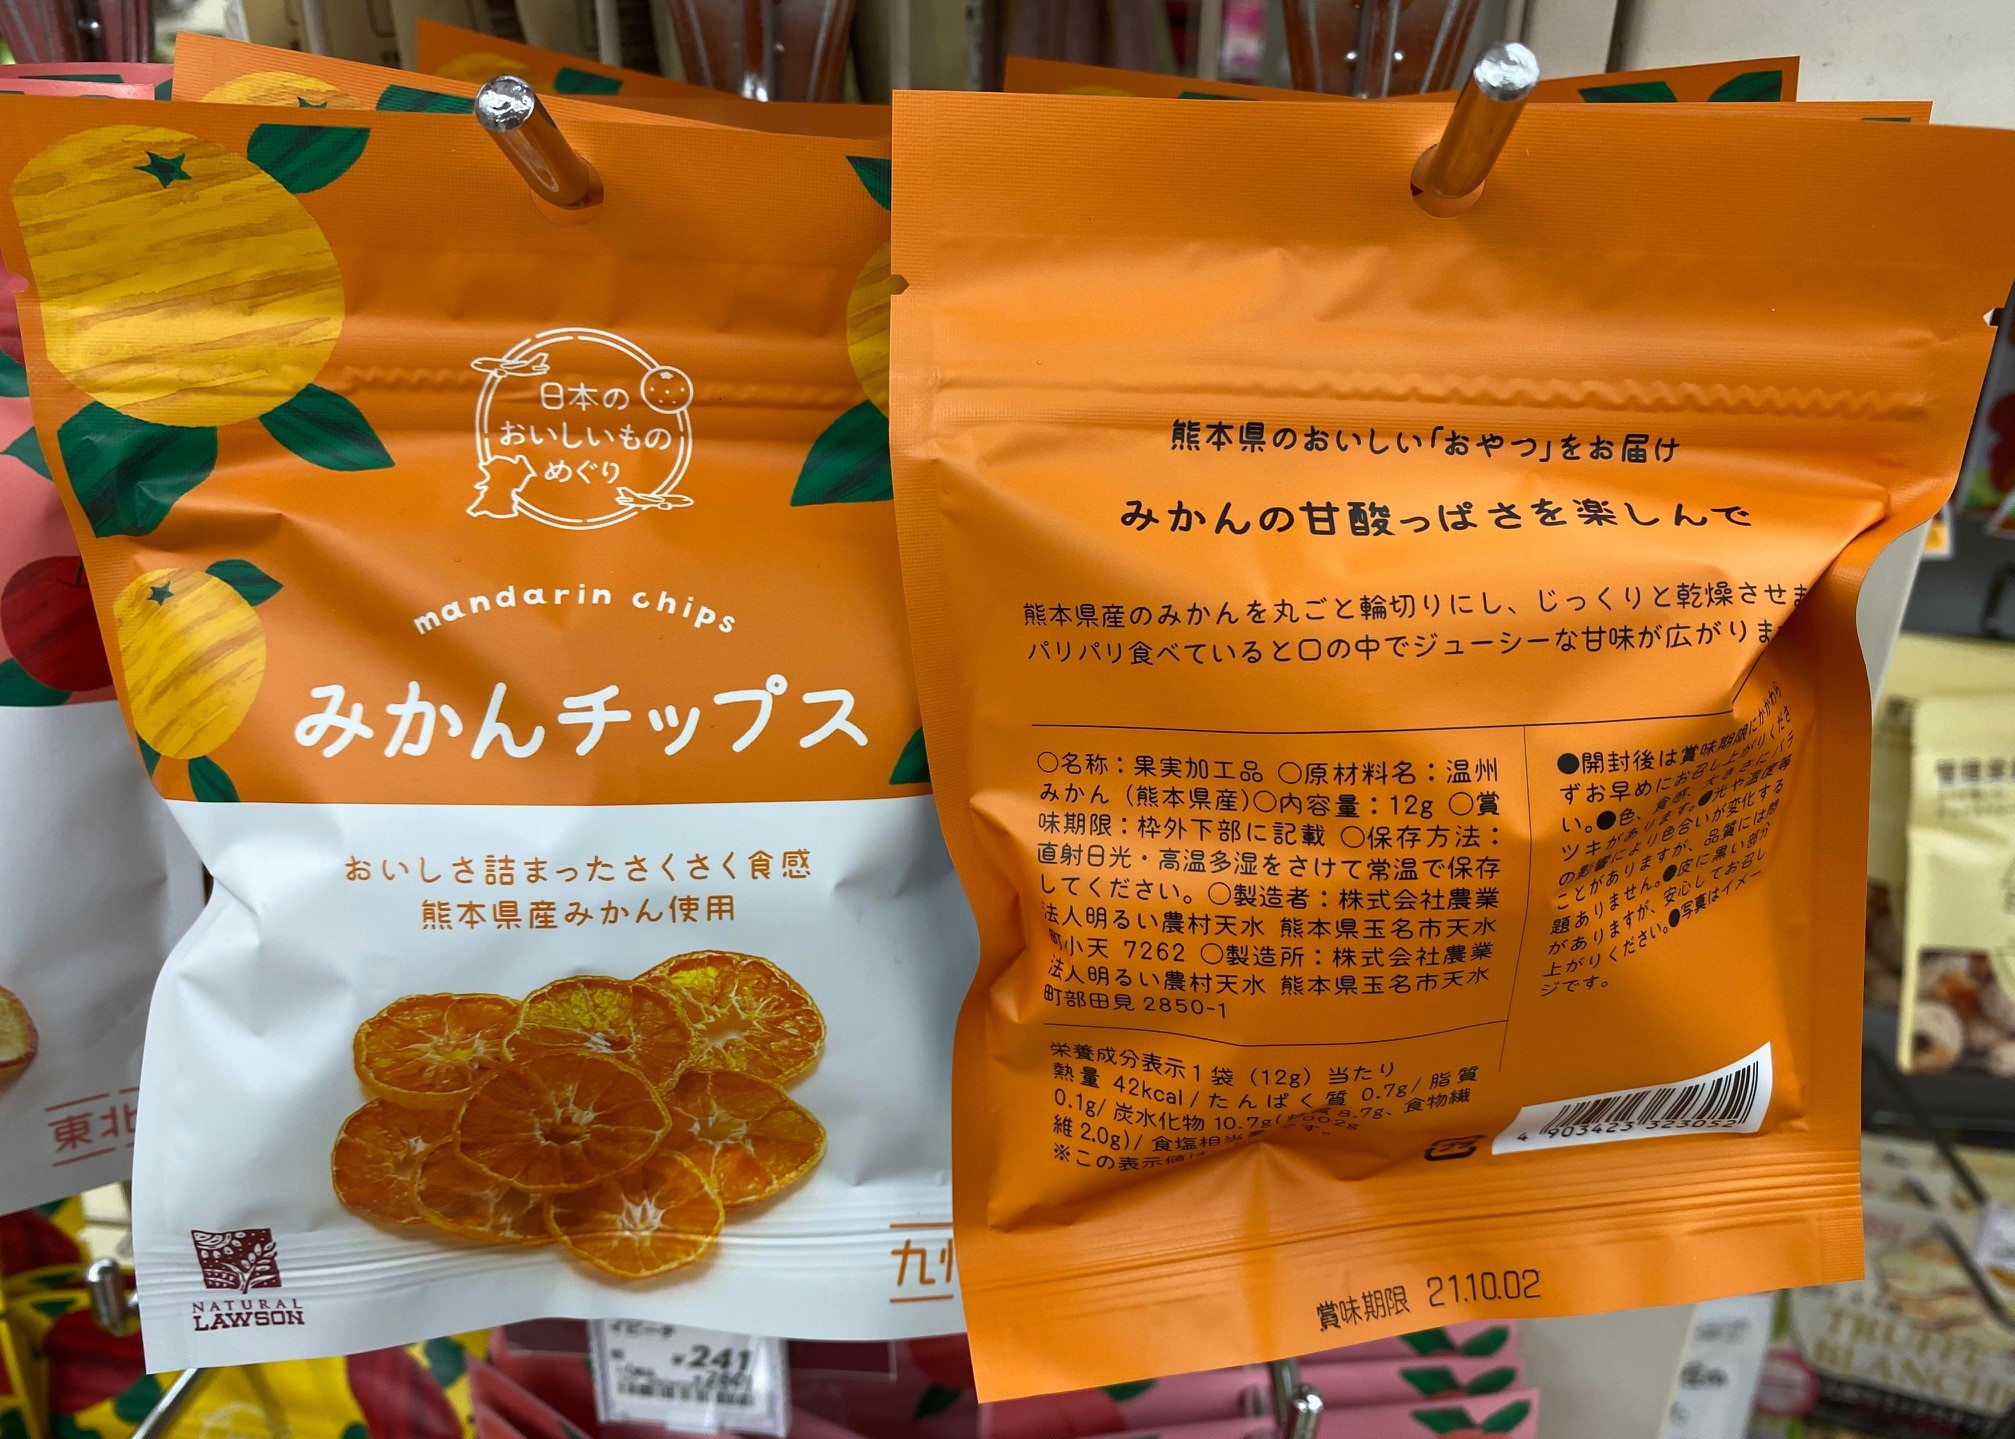 Japan Delicious Food Tour, Mandarin Chips